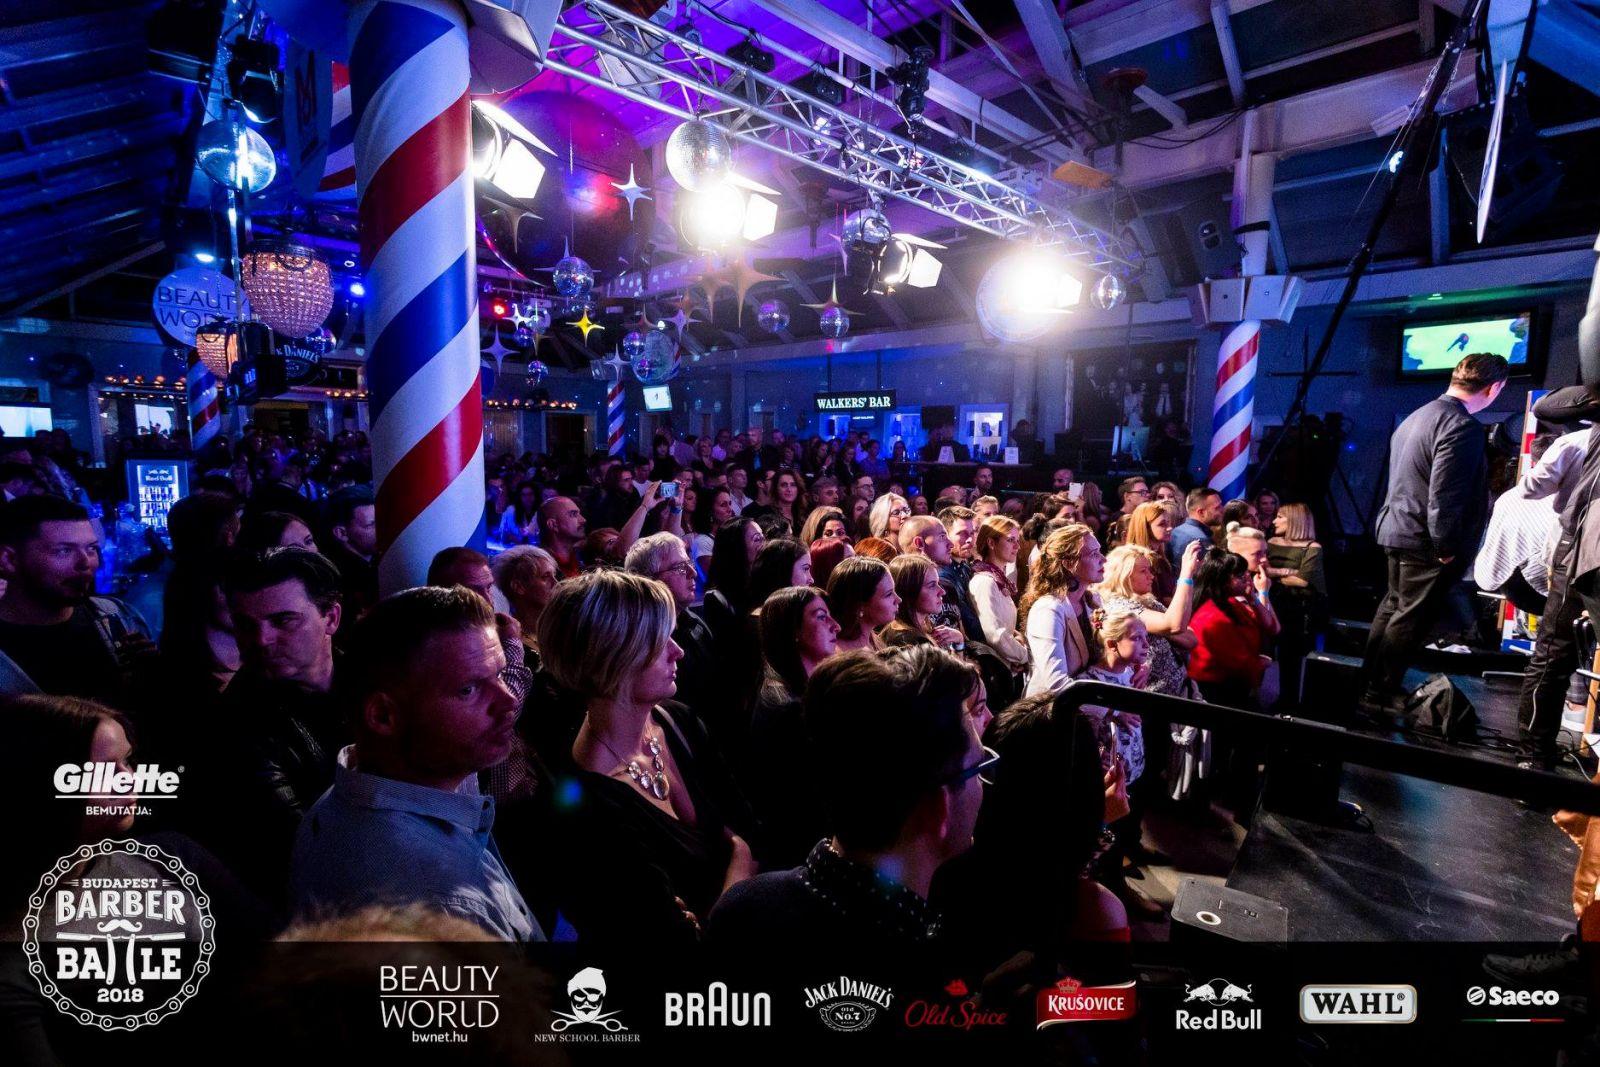 Barber Battle Budapest, Barber Battle 2019, barber, borbély, fodrász verseny, Beauty World Net online időpontfoglaló program, New School Barber